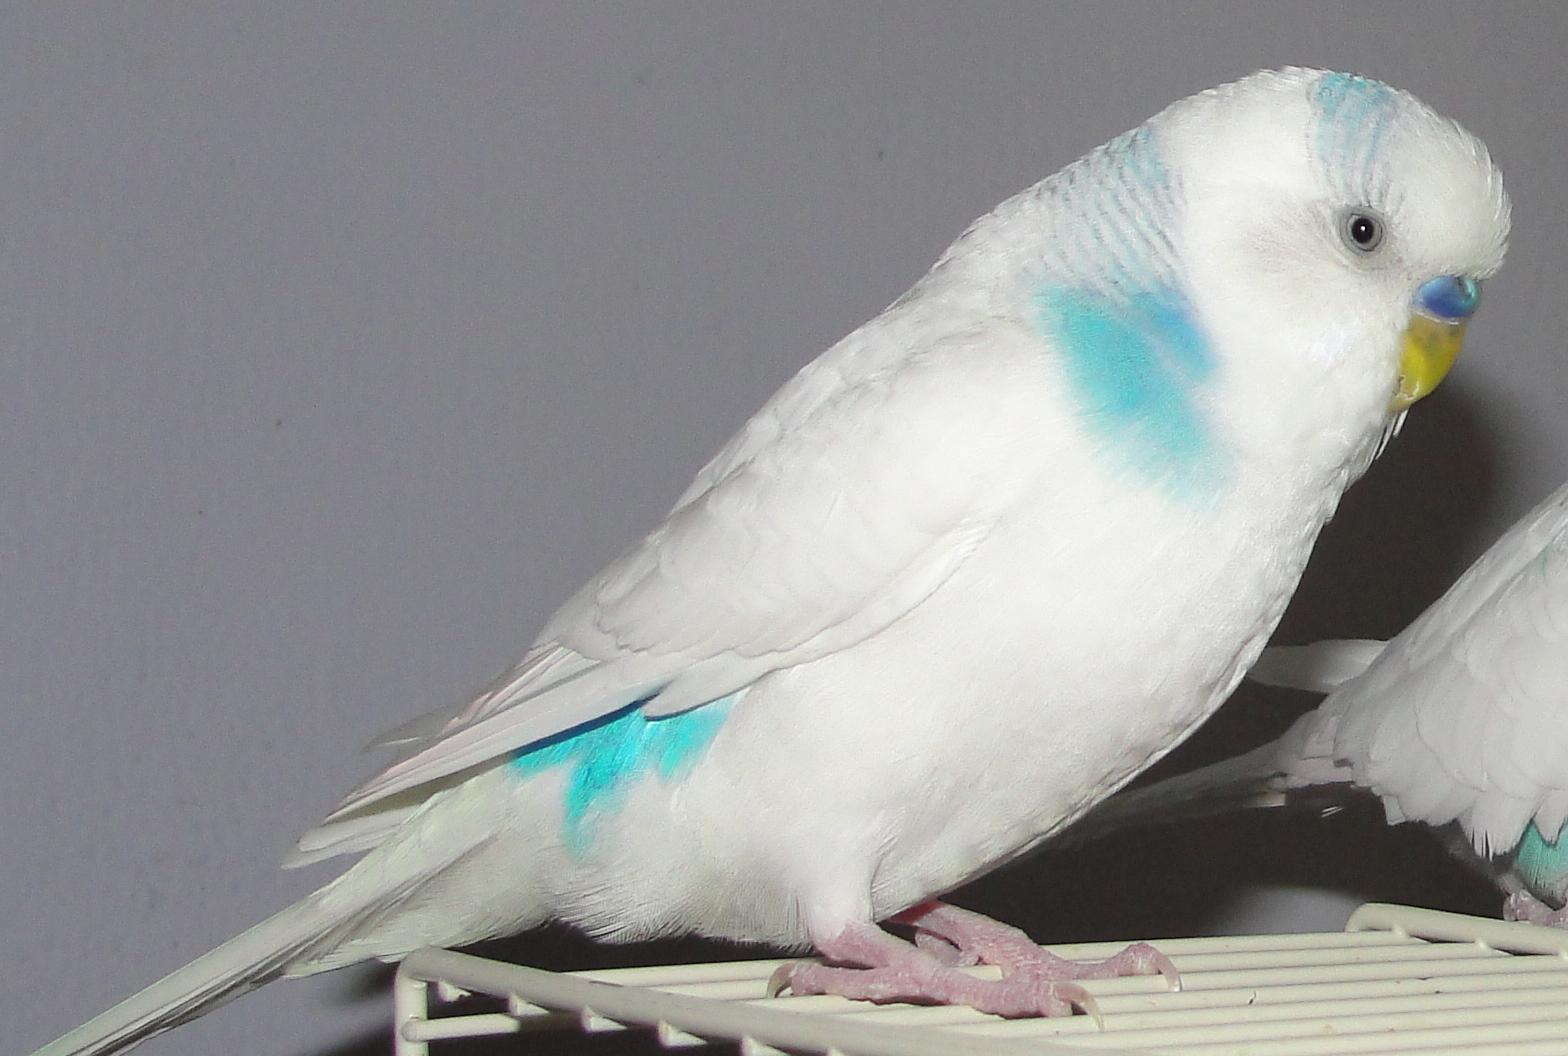 White Parakeets To the...